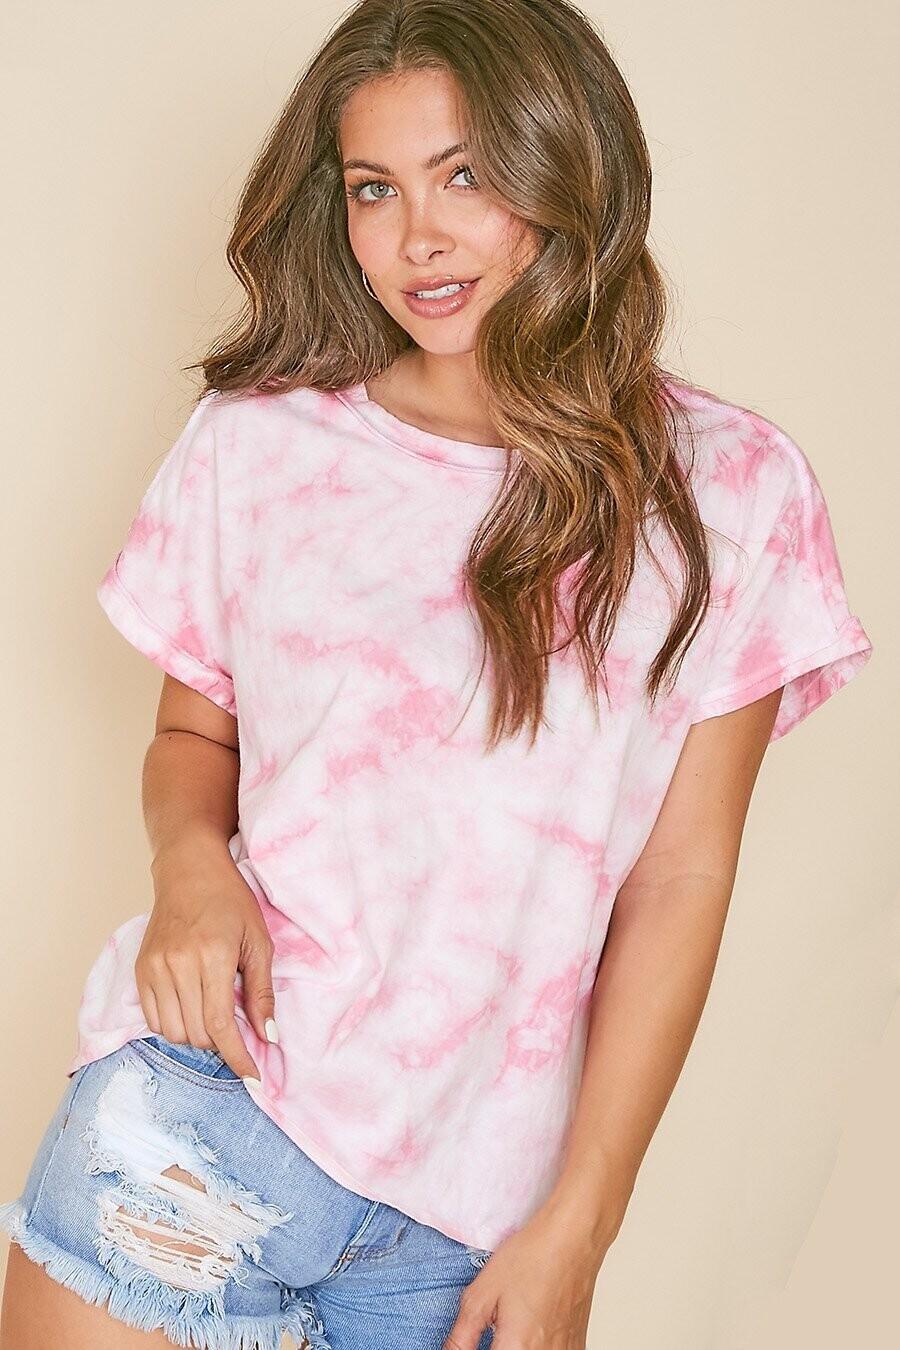 Peach Love OKT81643-01 Tie Dye SS Top